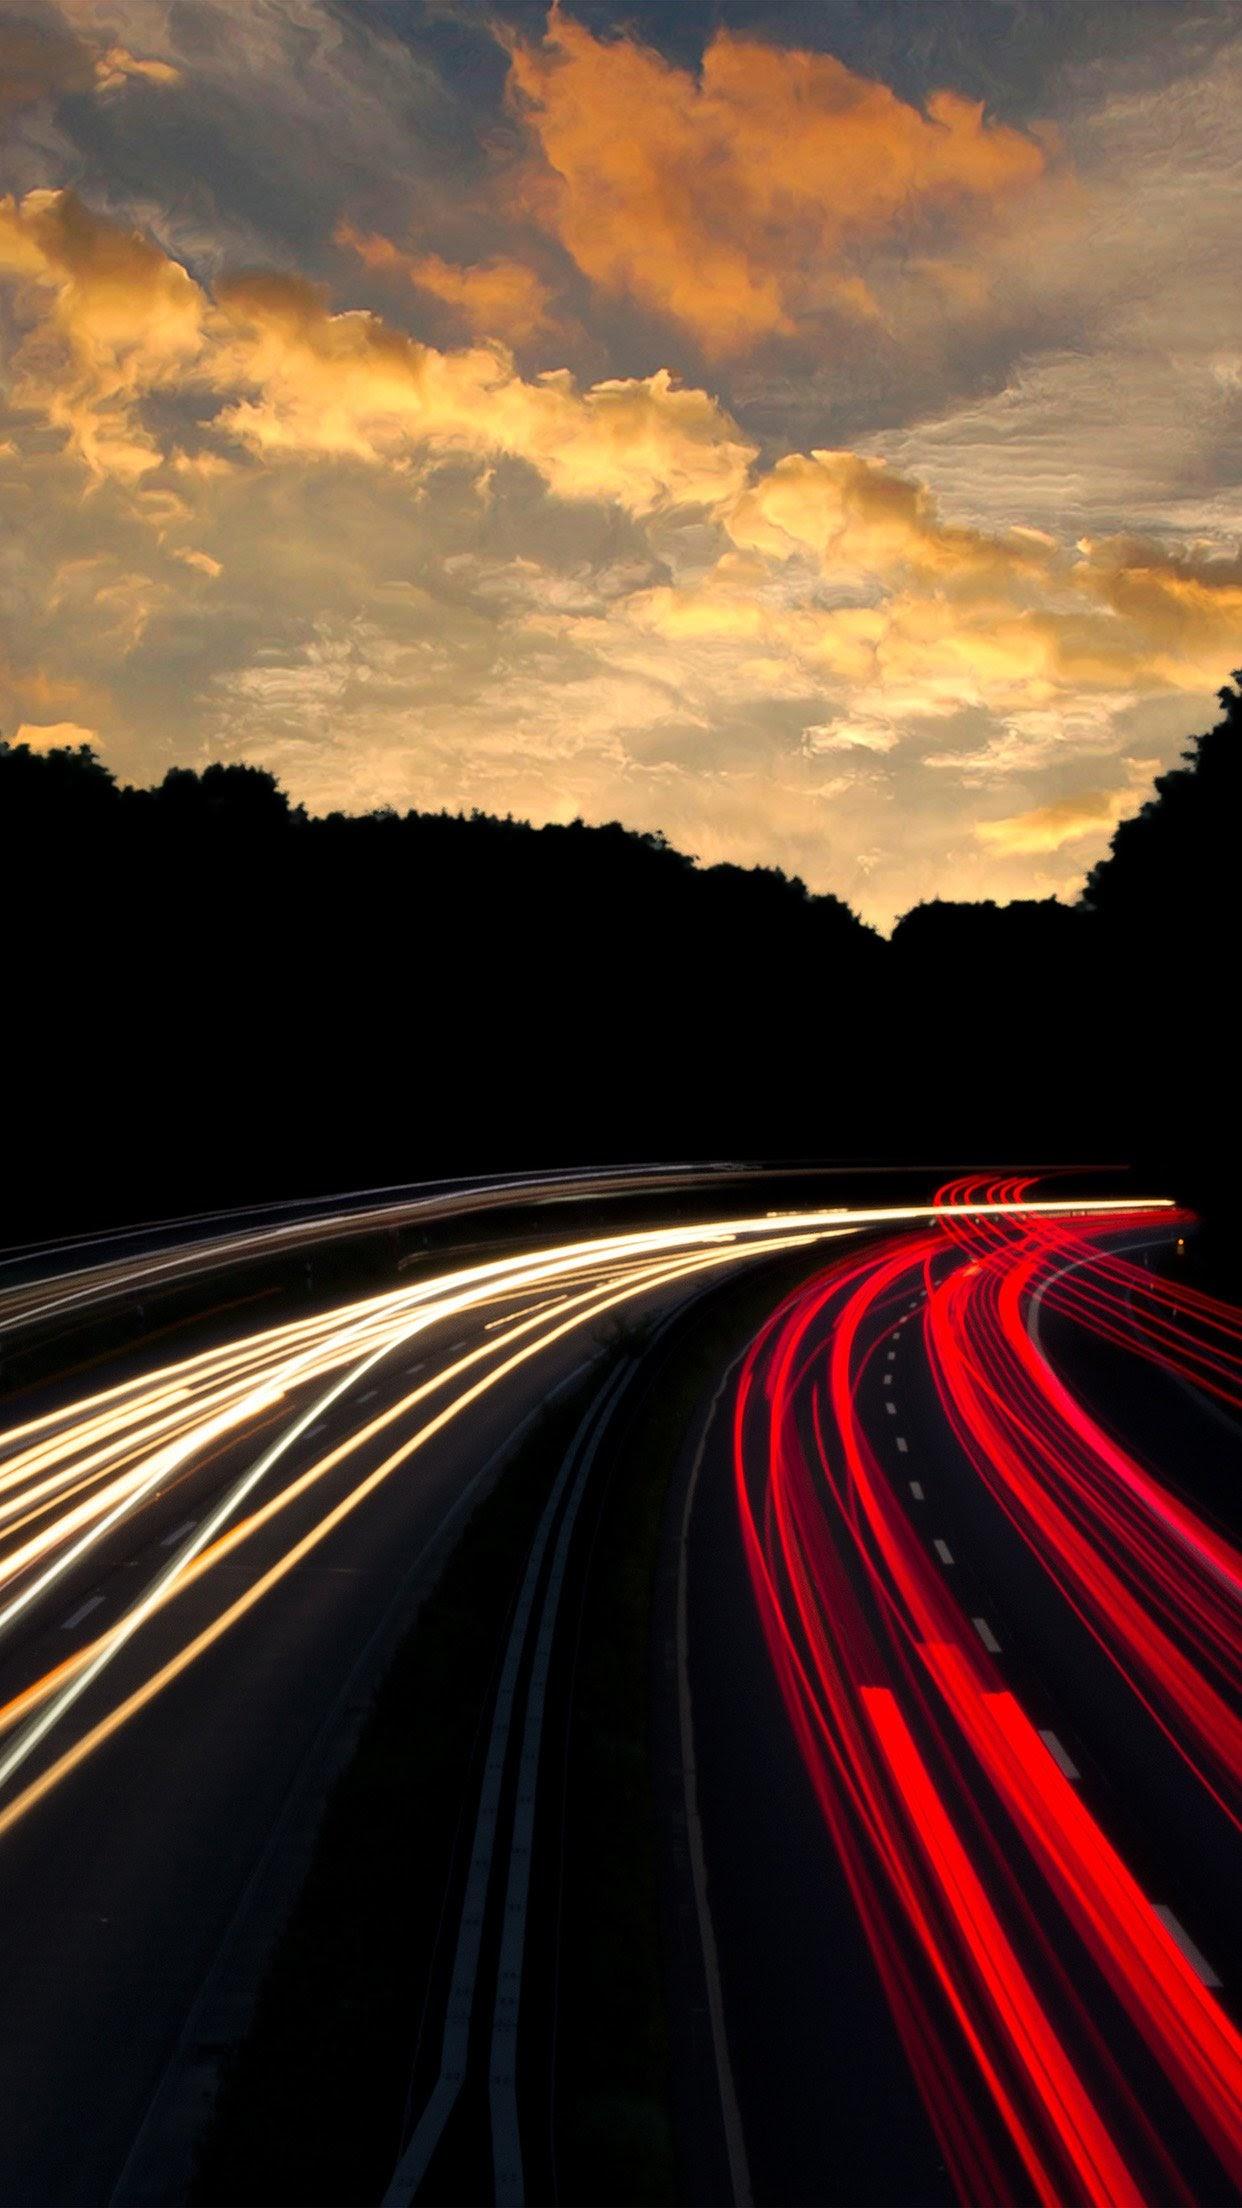 papers-co-ni07-night-drive-car-light-red-dark-34-iphone6-plus-wallpaper